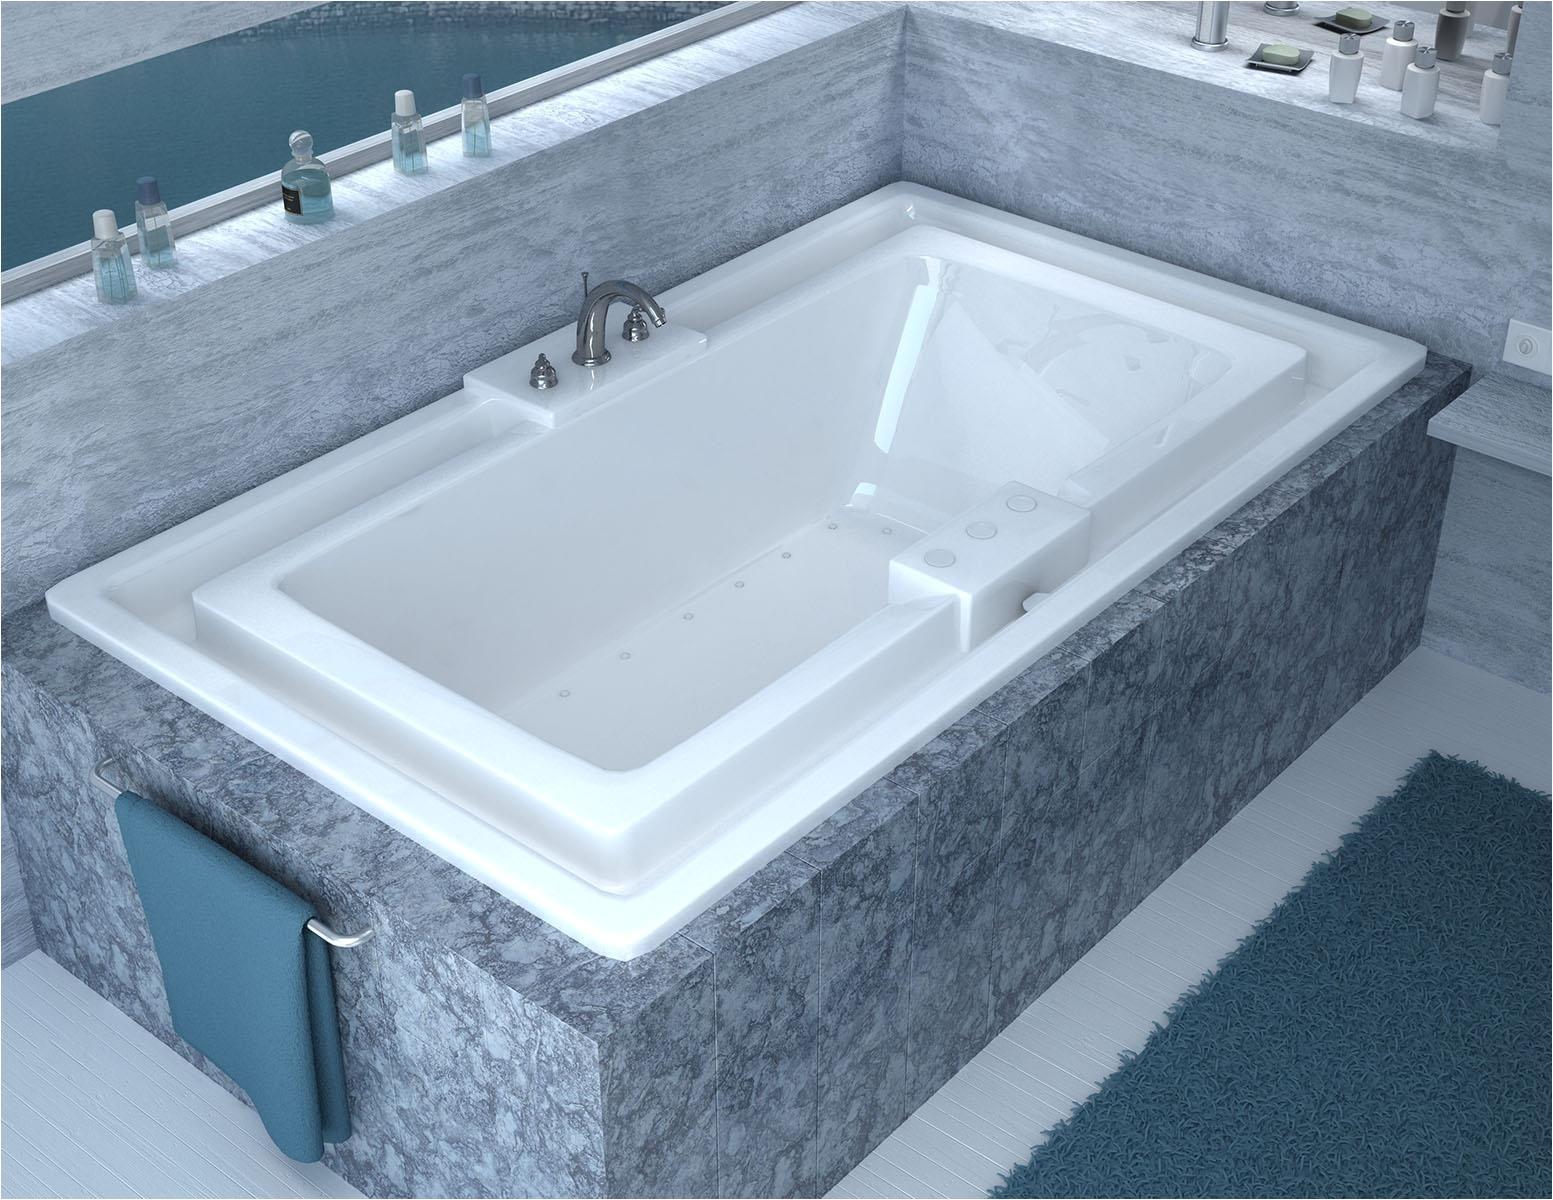 venzi celio 46 x 78 endless flow air jetted bathtub with center drain